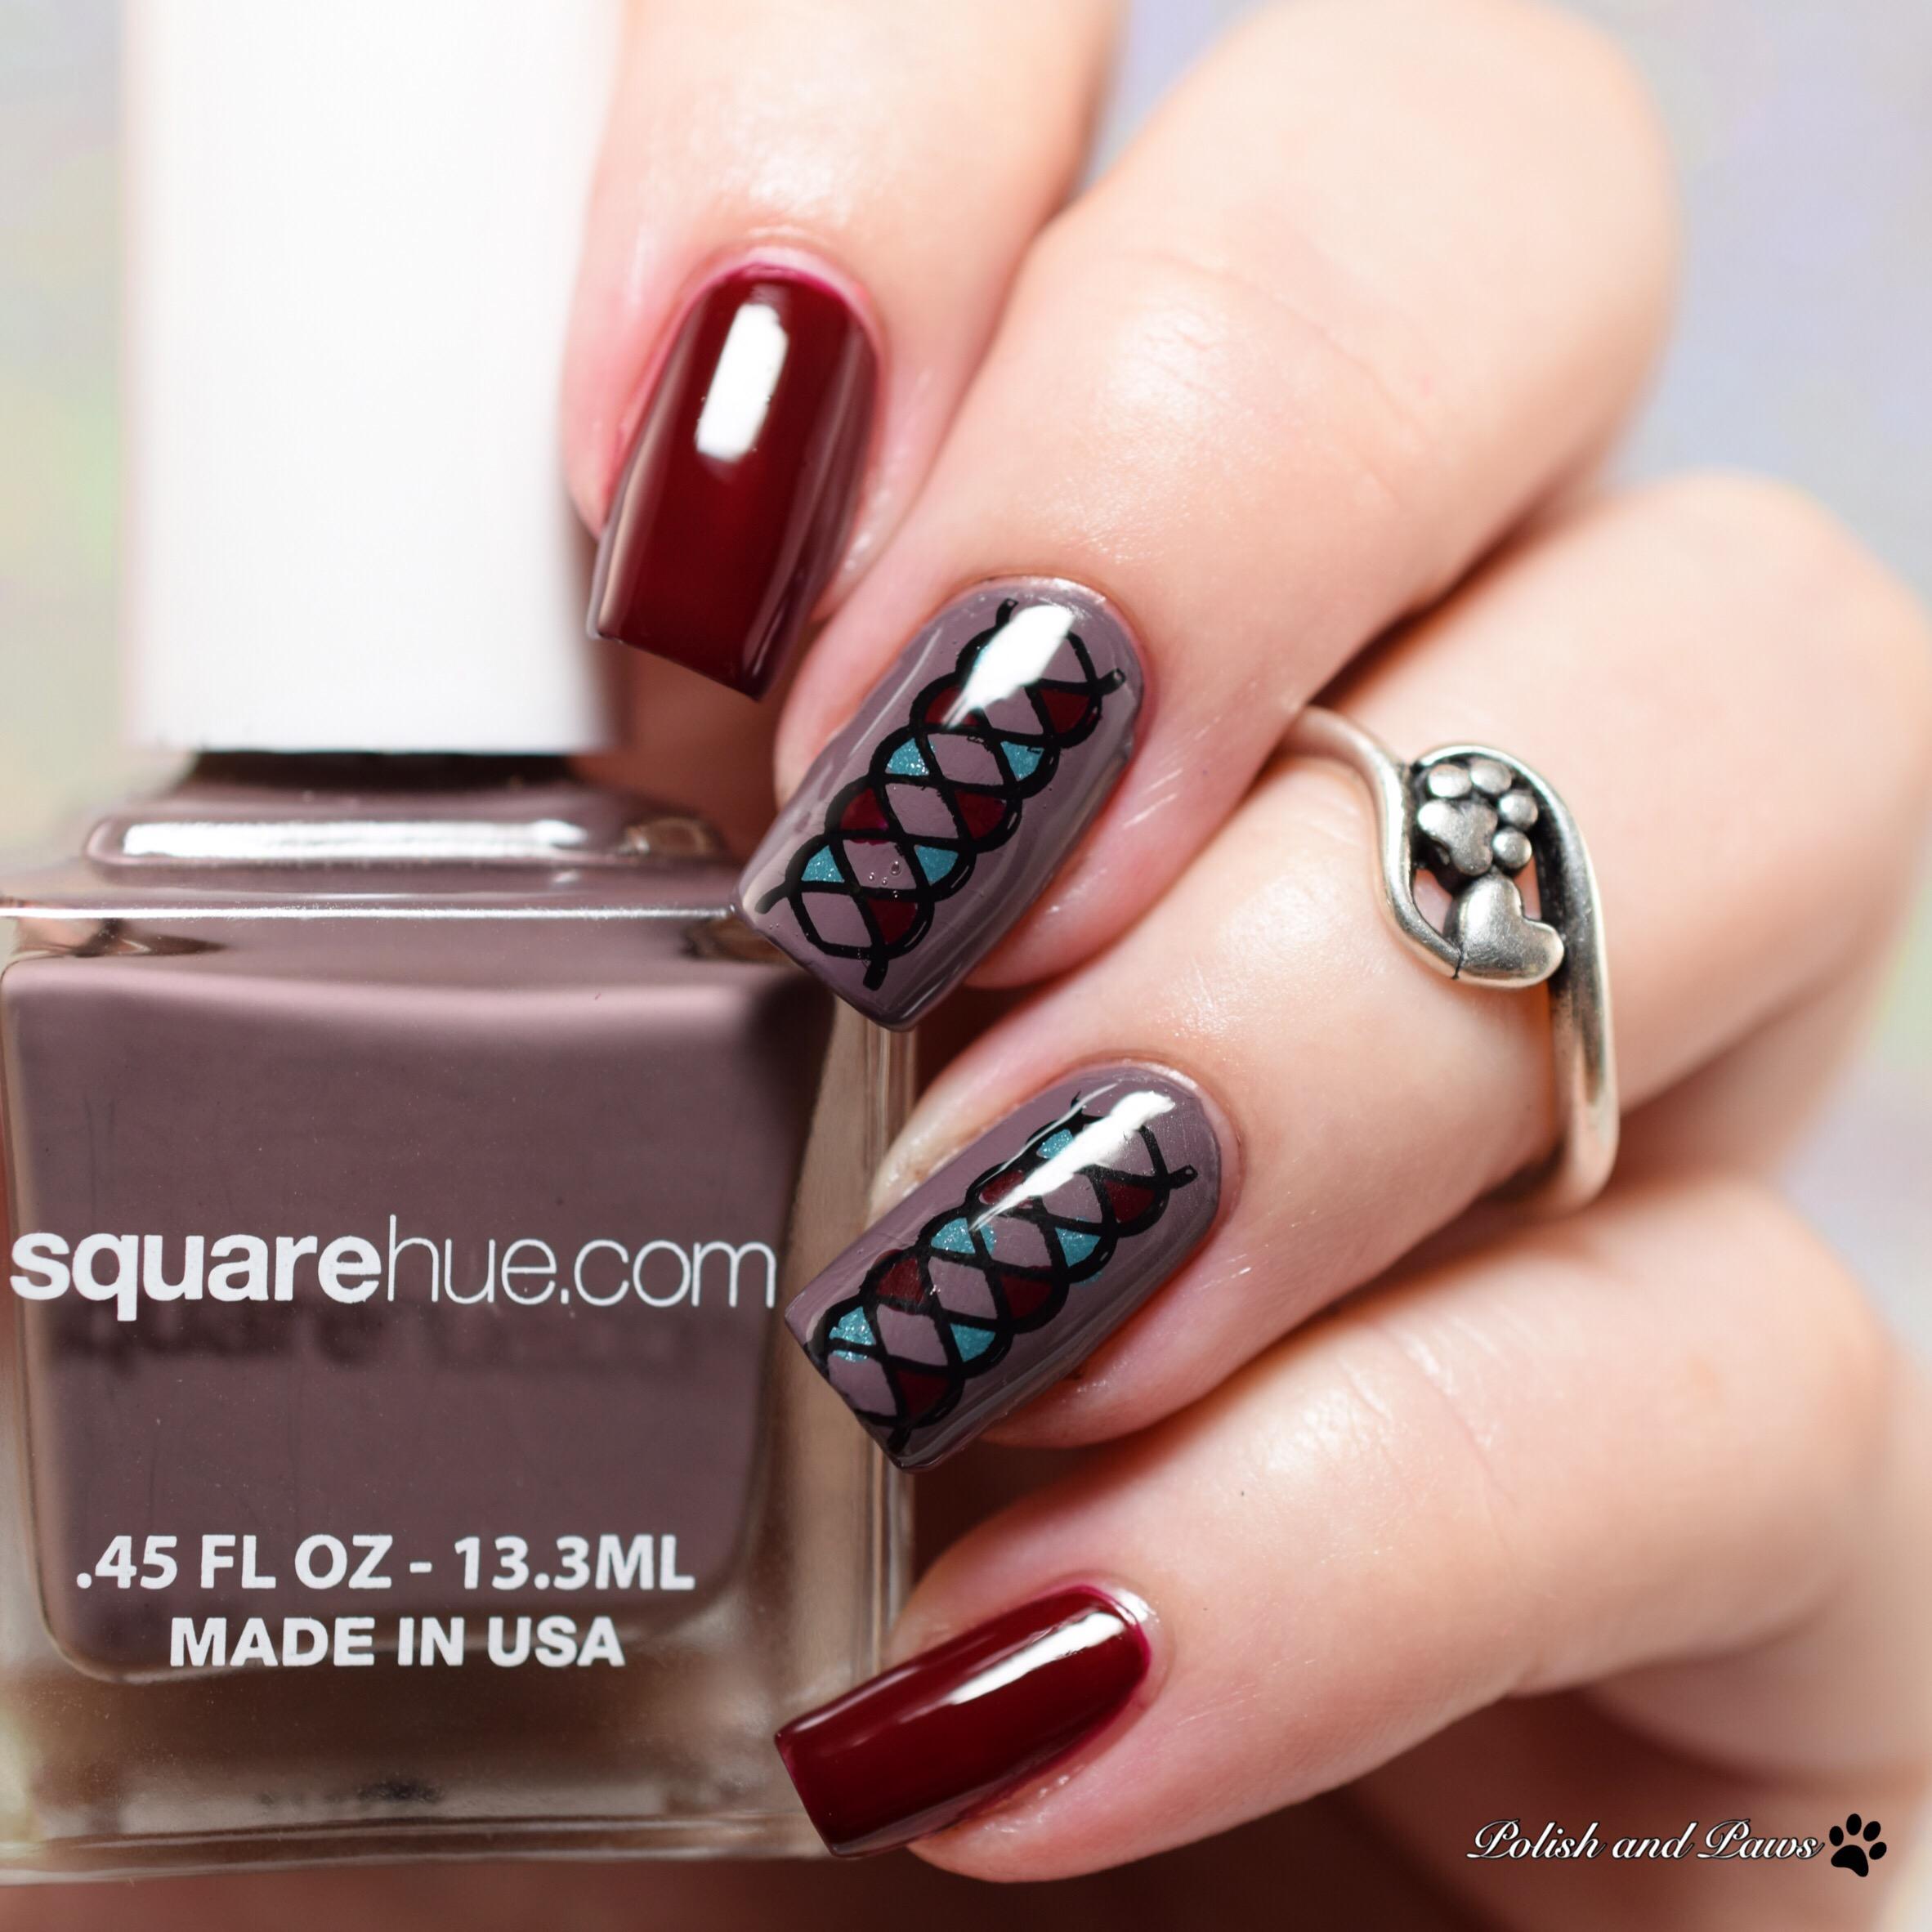 Square Hue Gondola Venice Nail Art